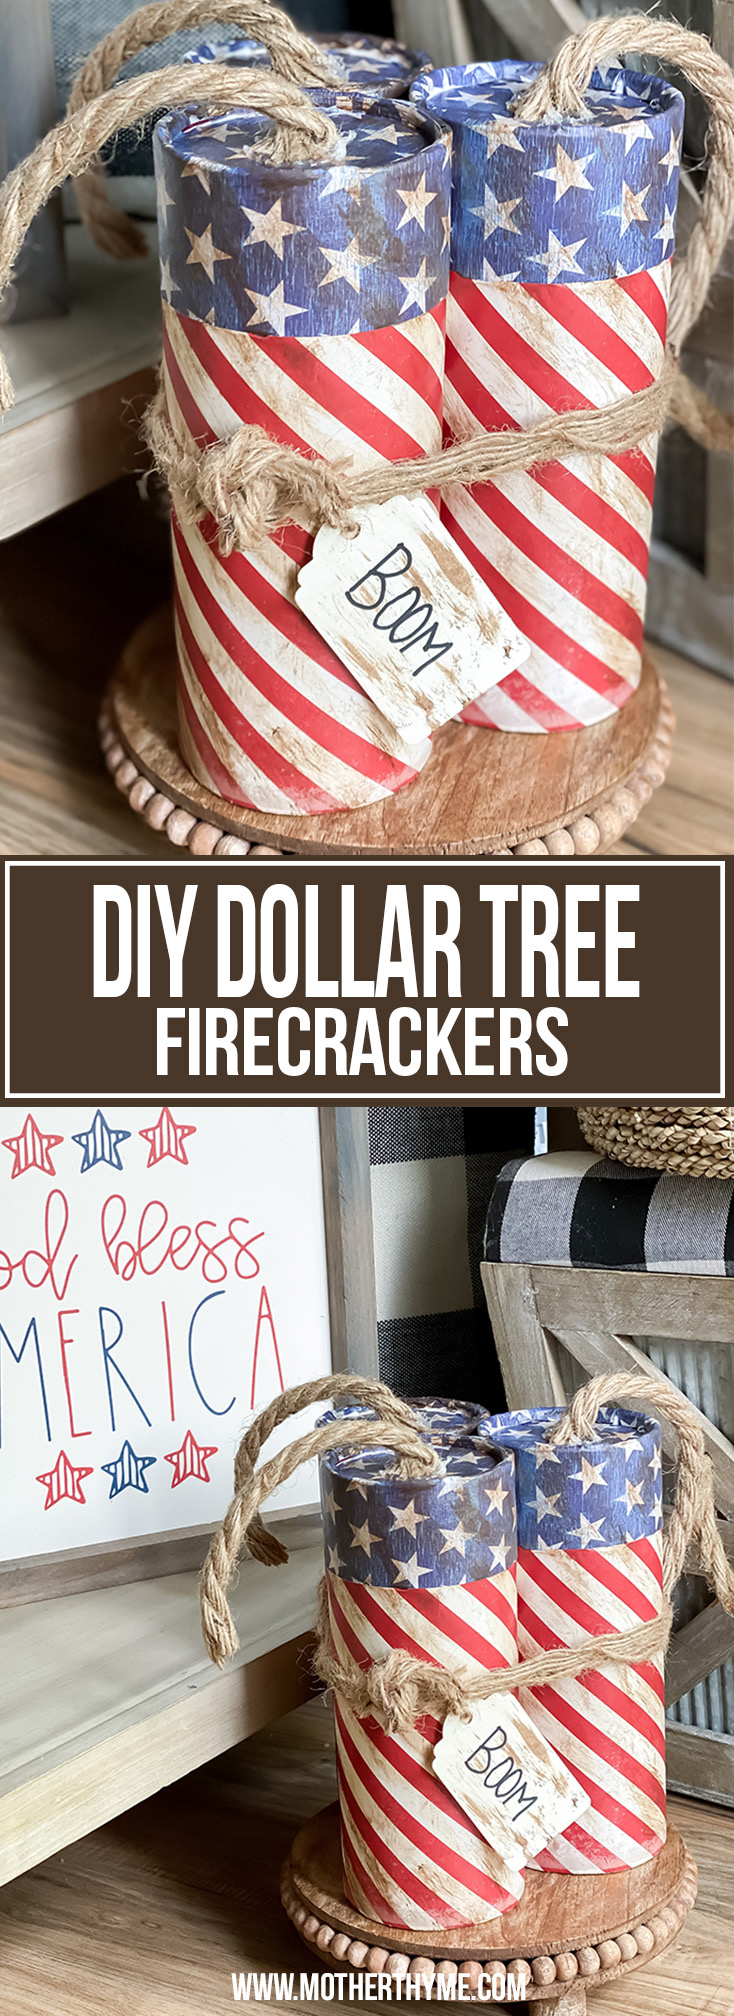 DIY DOLLAR TREE FIRECRACKERS